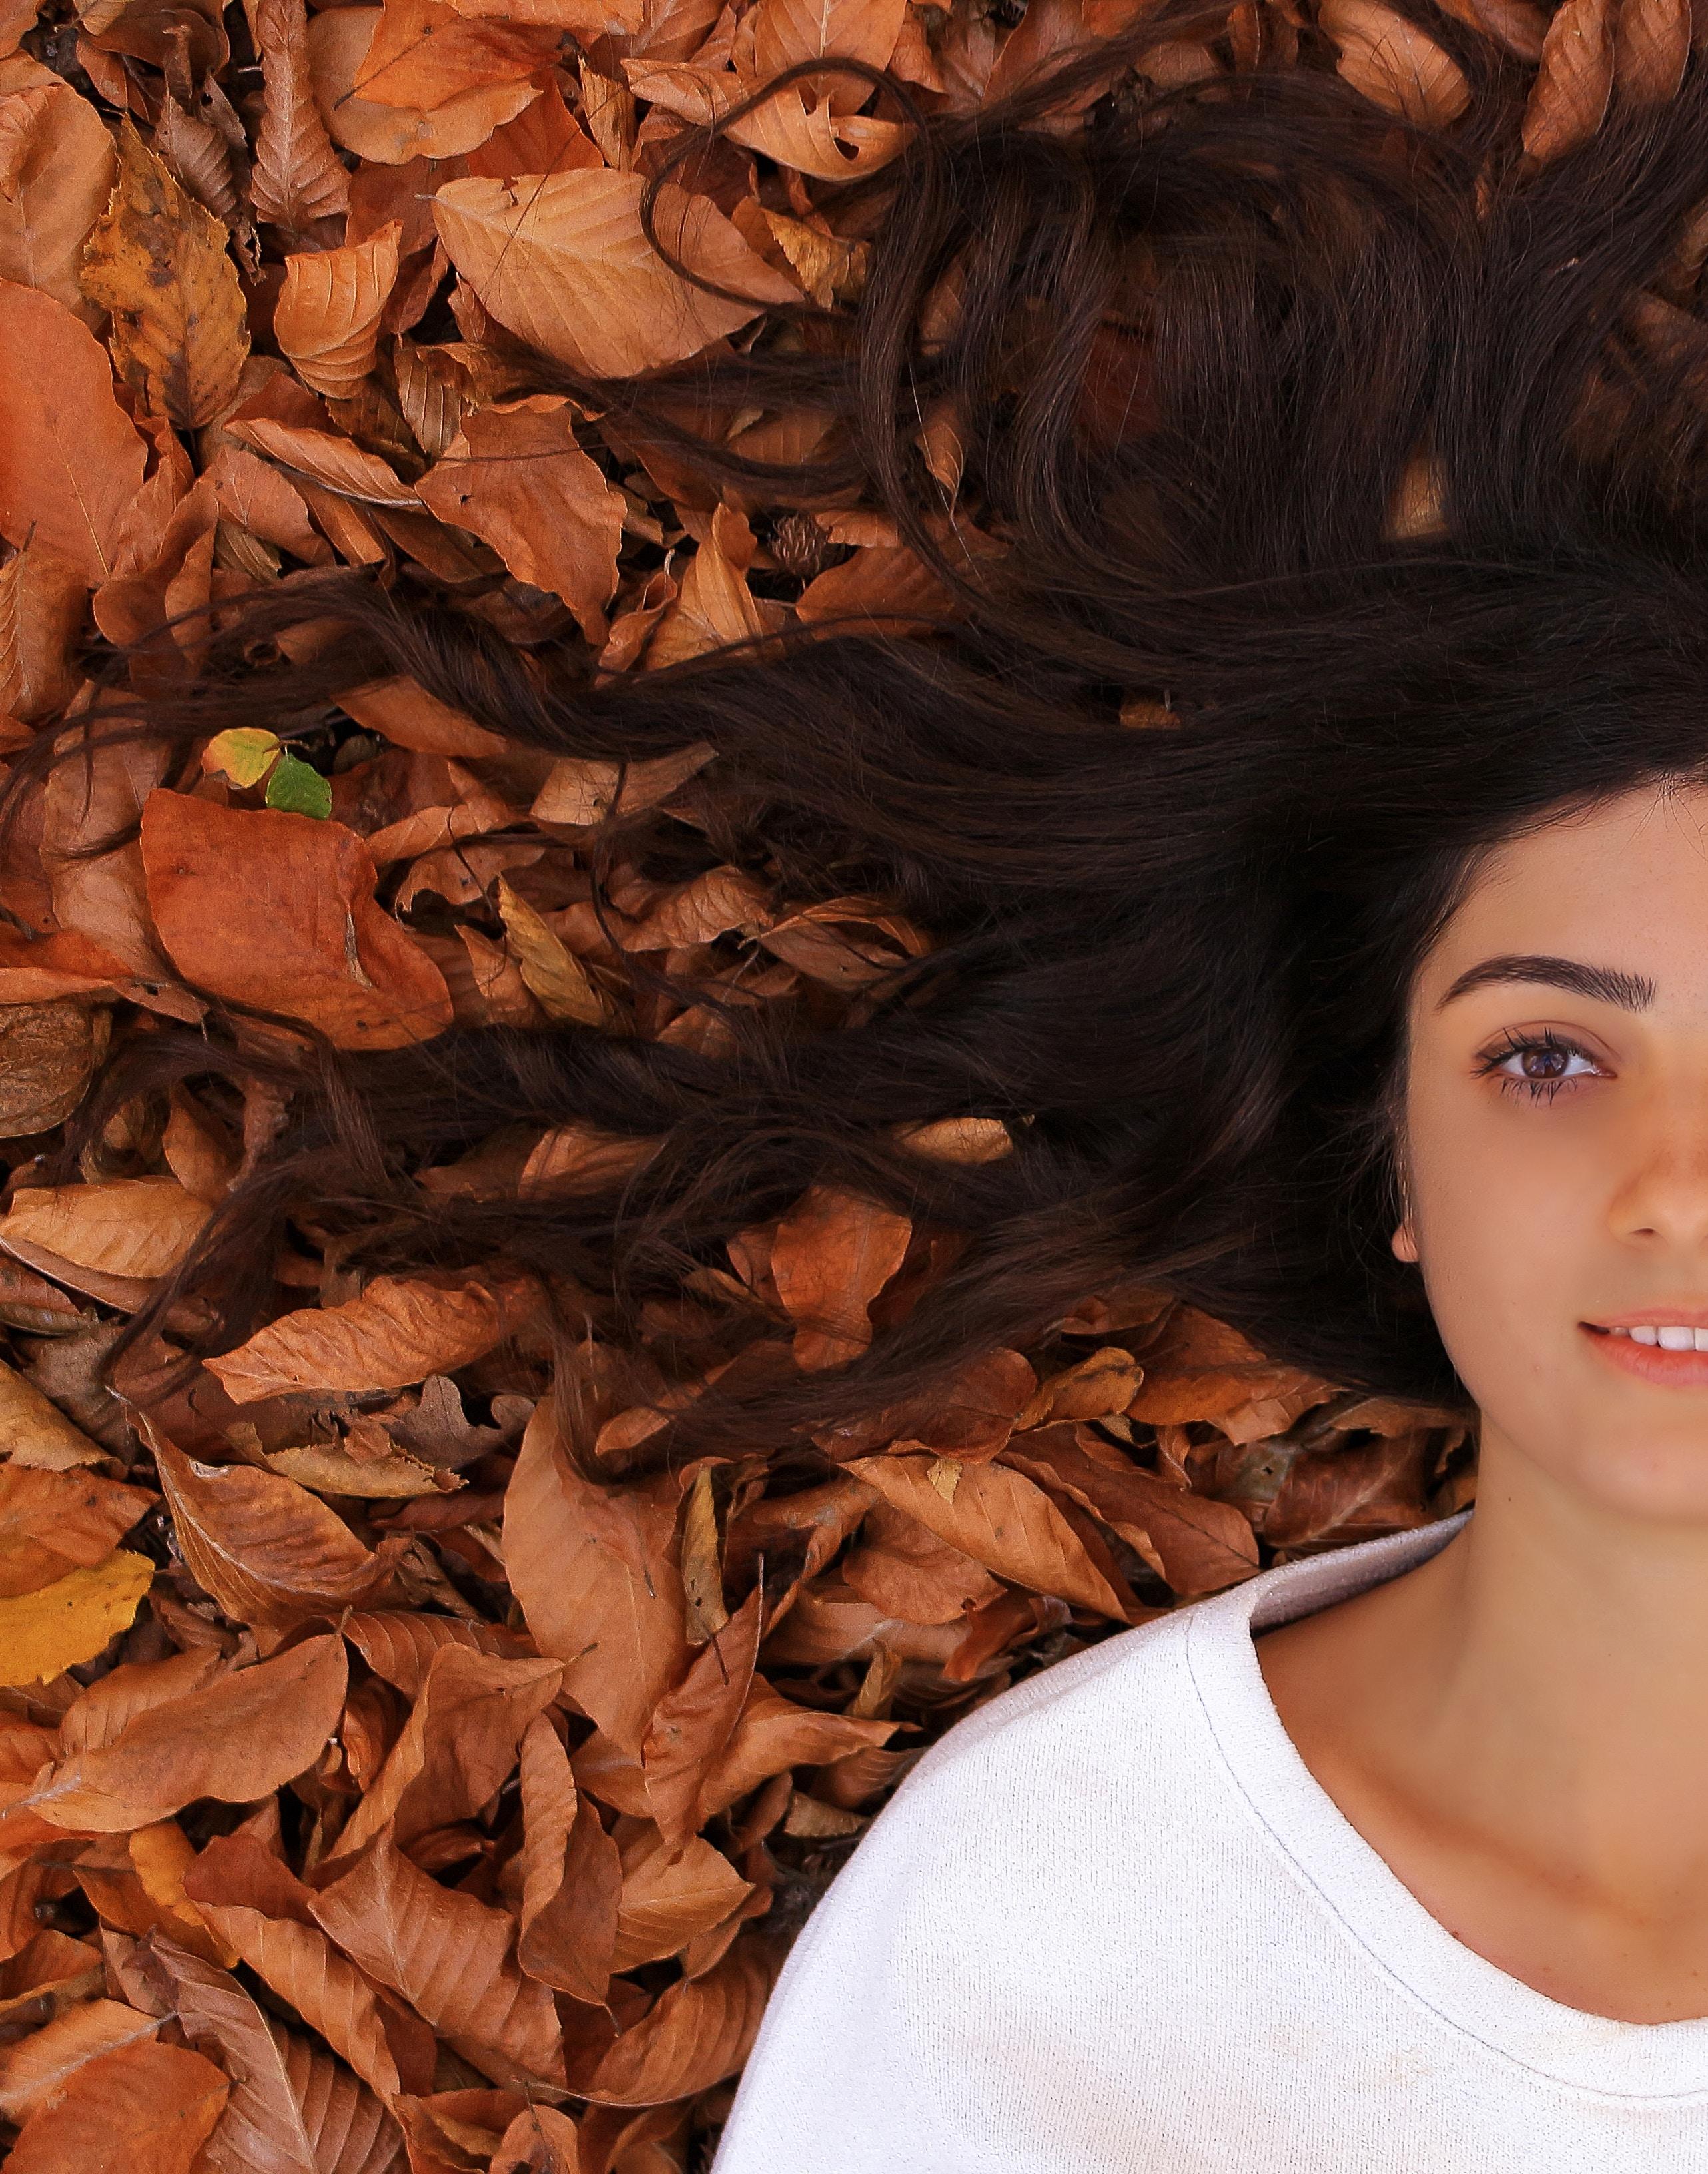 esi gatava rudenim āda mati